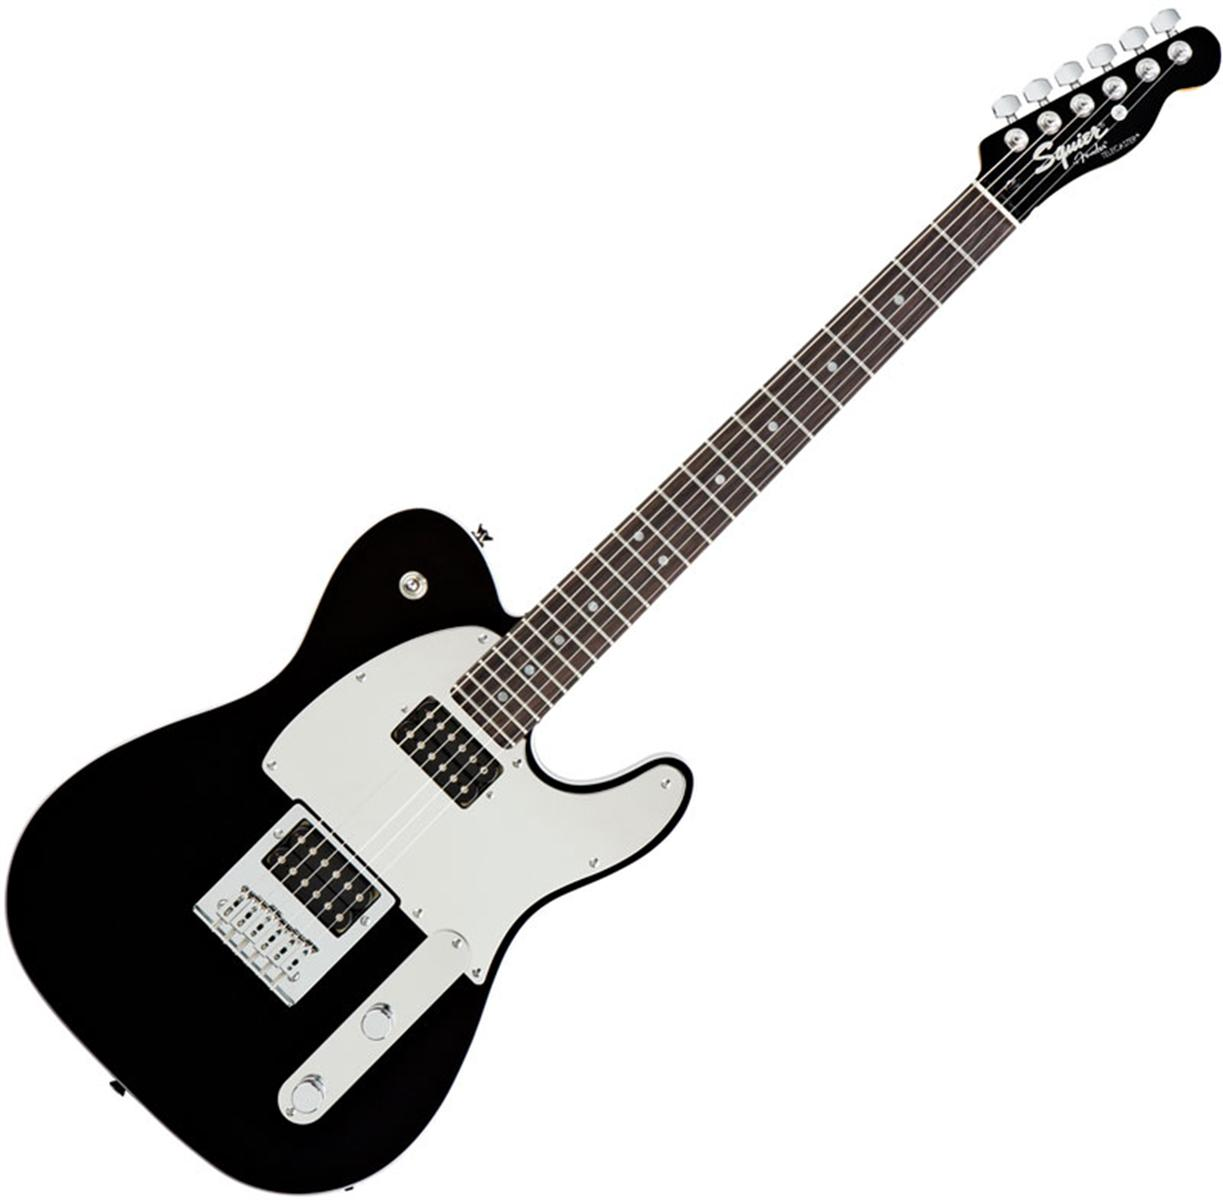 Black Electric Guitar Clip Art | Clipart Panda - Free ...